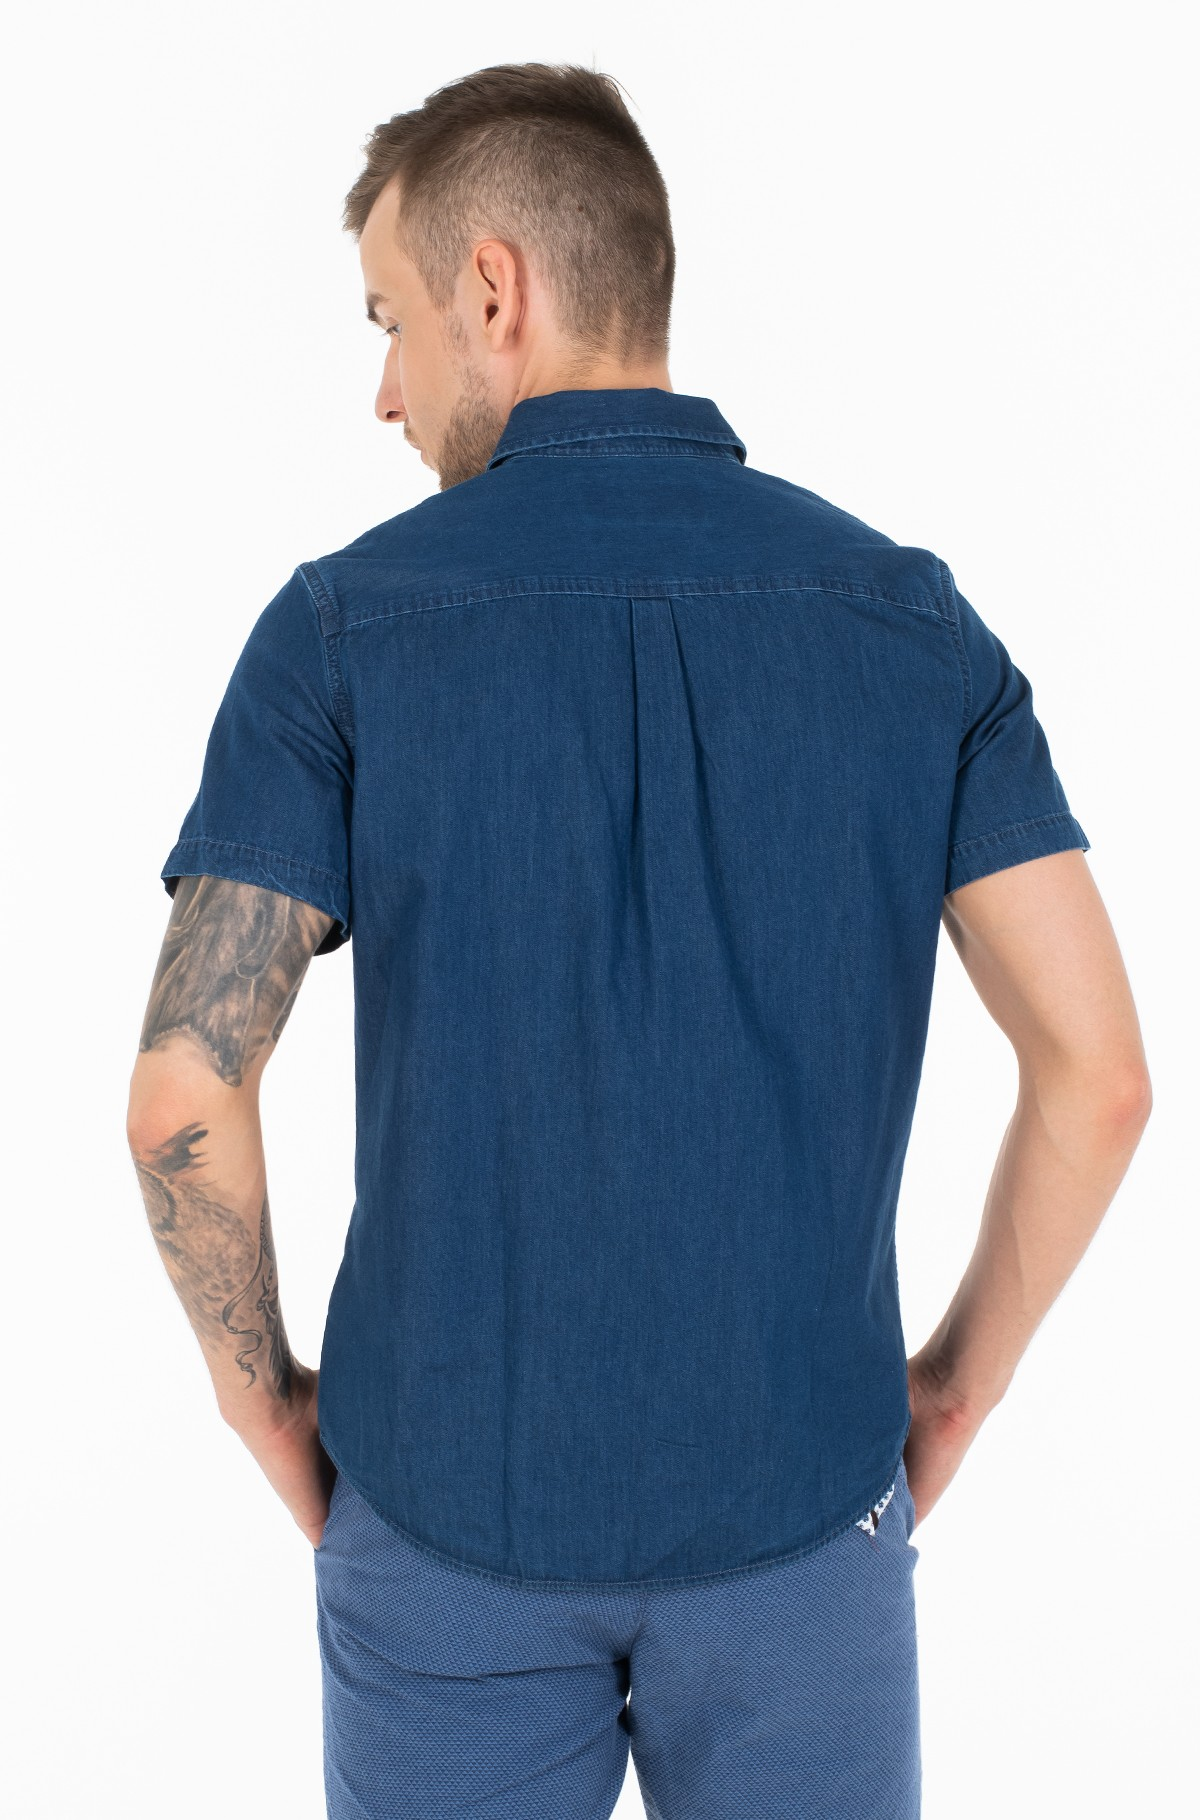 Marškiniai su trumpomis rankovėmis INDIGO INSTIT POCKET REG SS-full-2